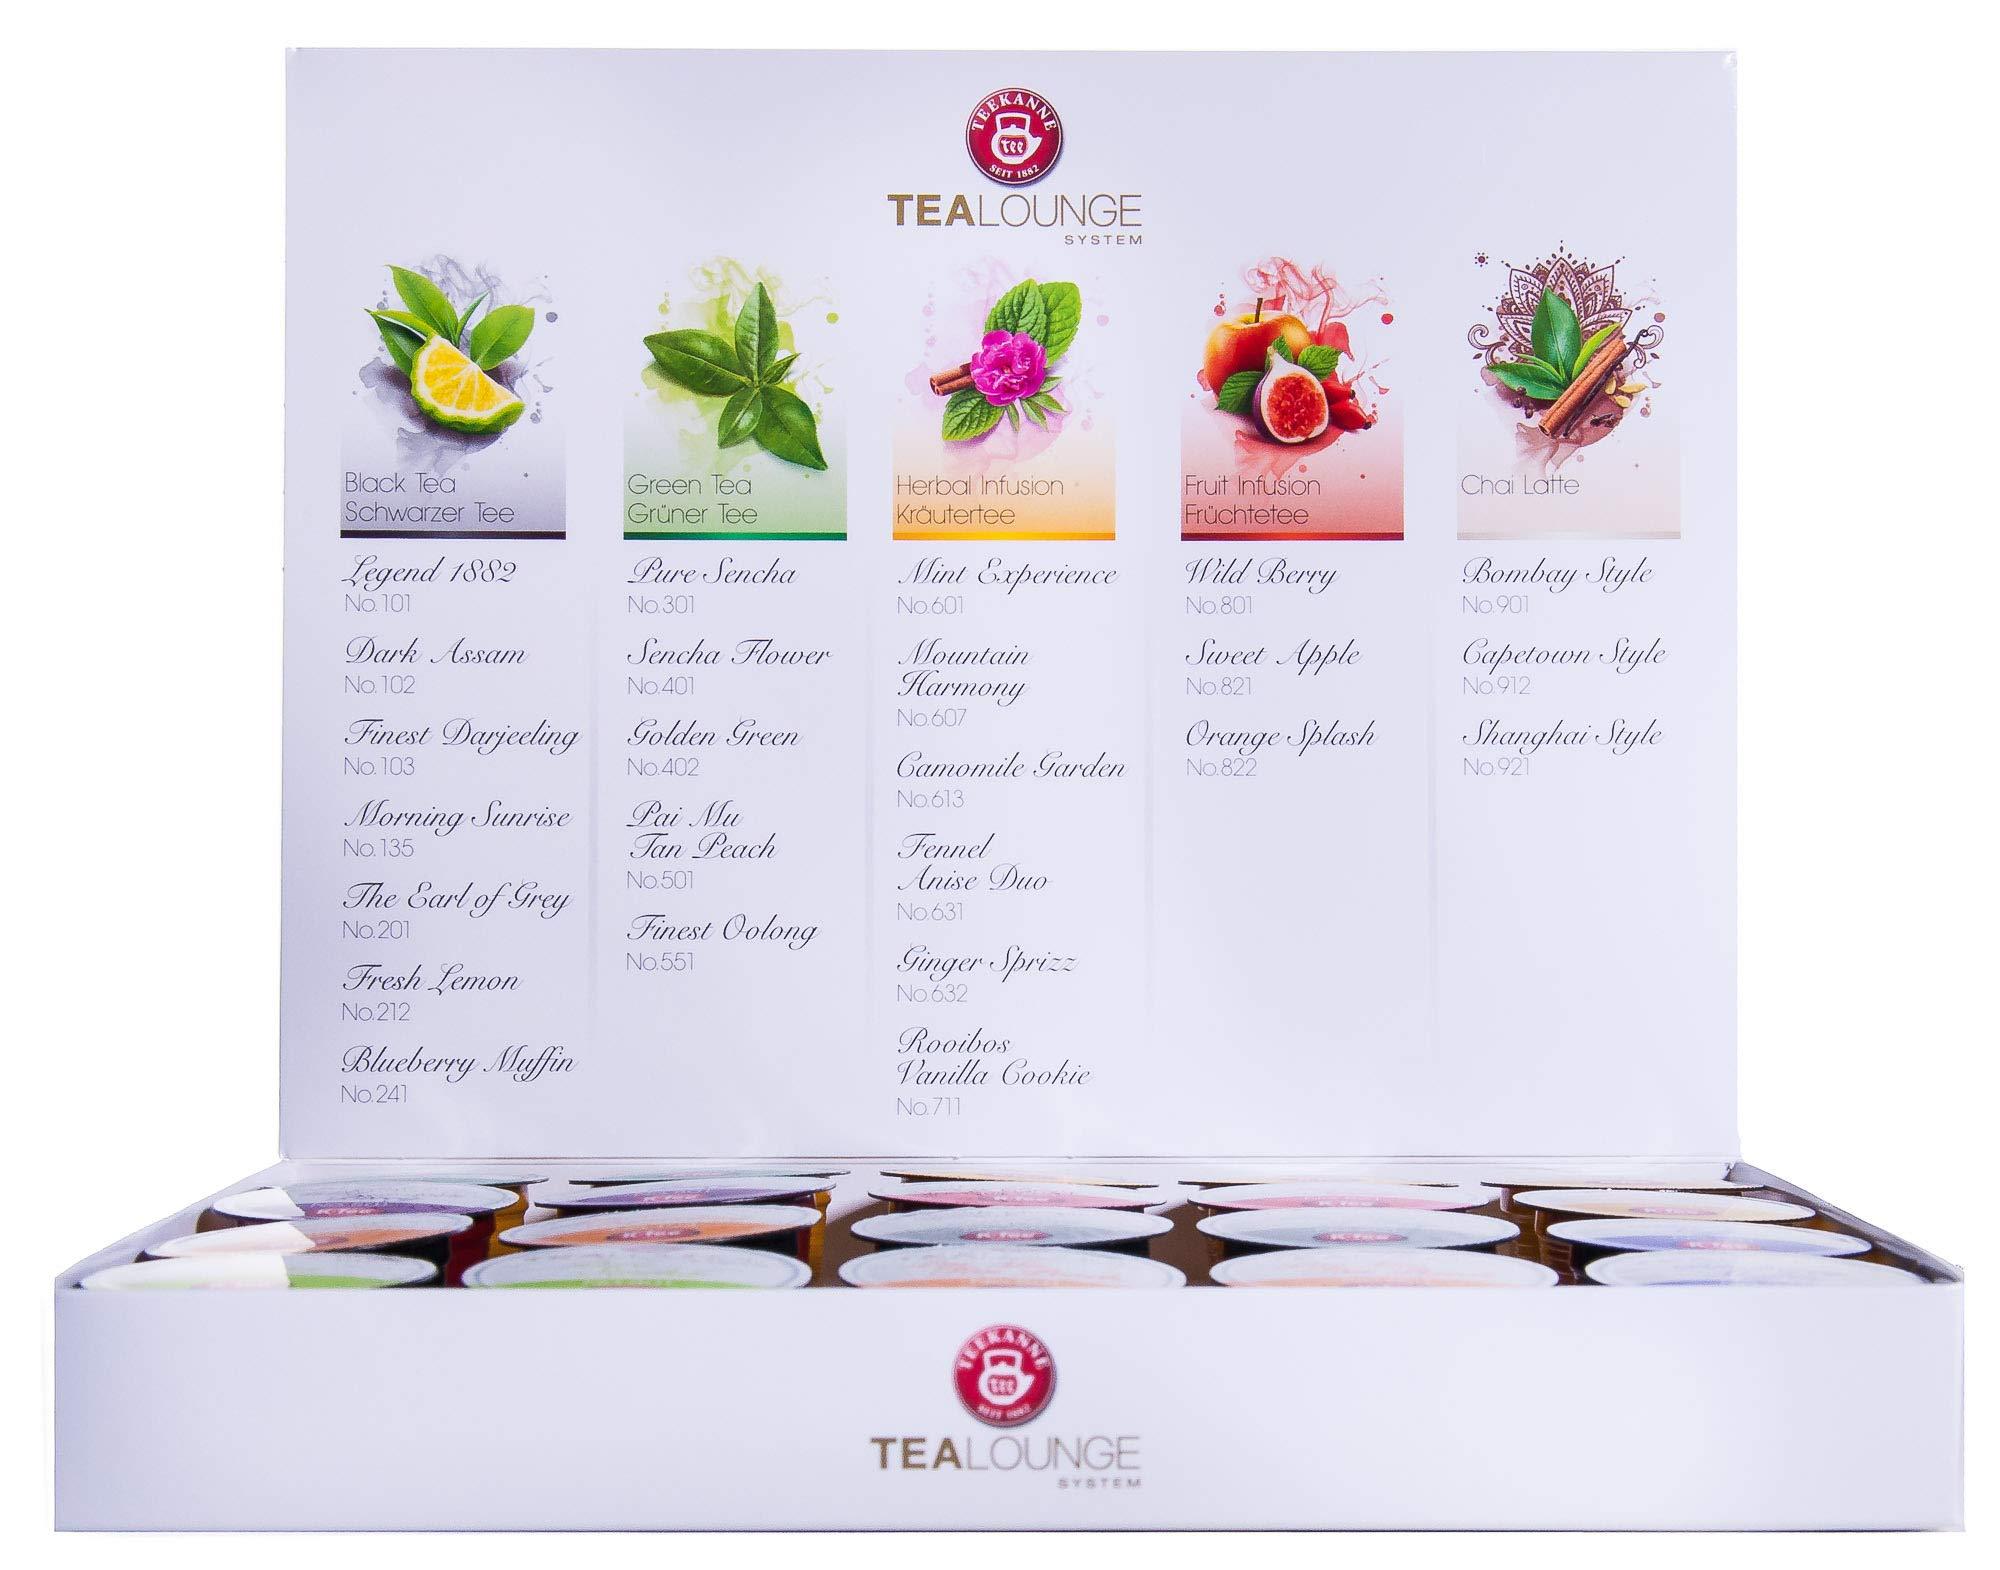 Teekanne-Tealounge-Kapseln-20-Teekapseln-Probierset-Geschenkbox